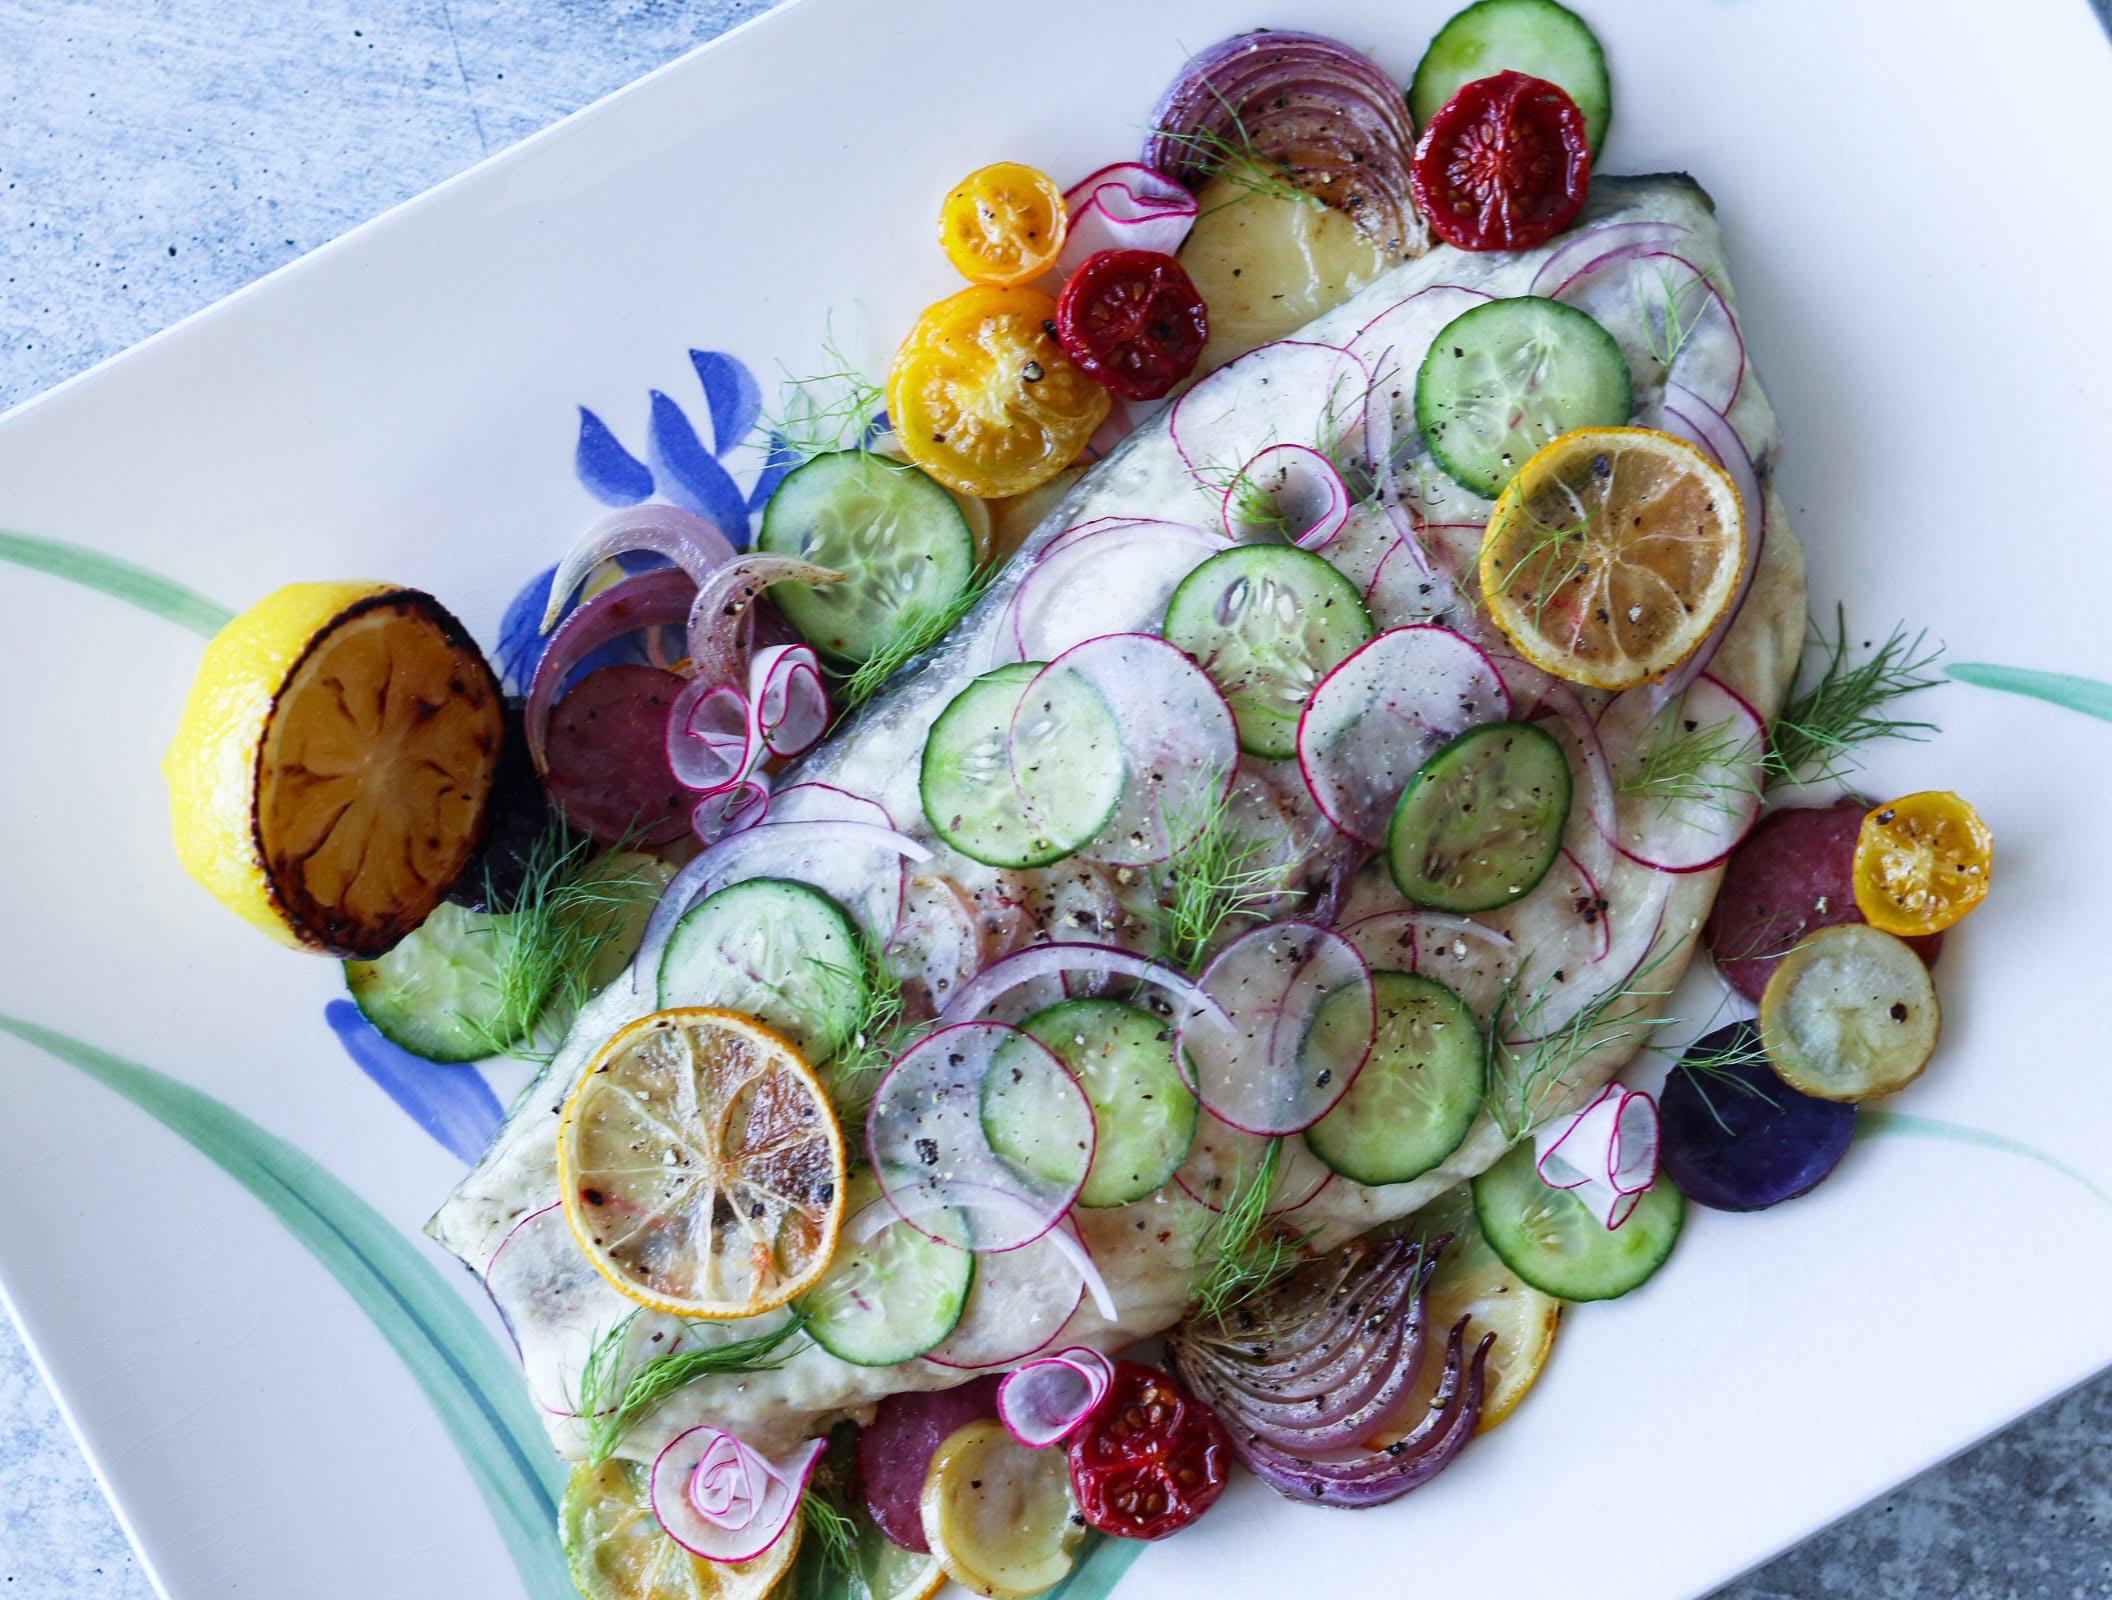 Barramundi with roasted fingerling potatoes, cherry tomatoes, red onions, cucumbers, radishes, lemons, fennel